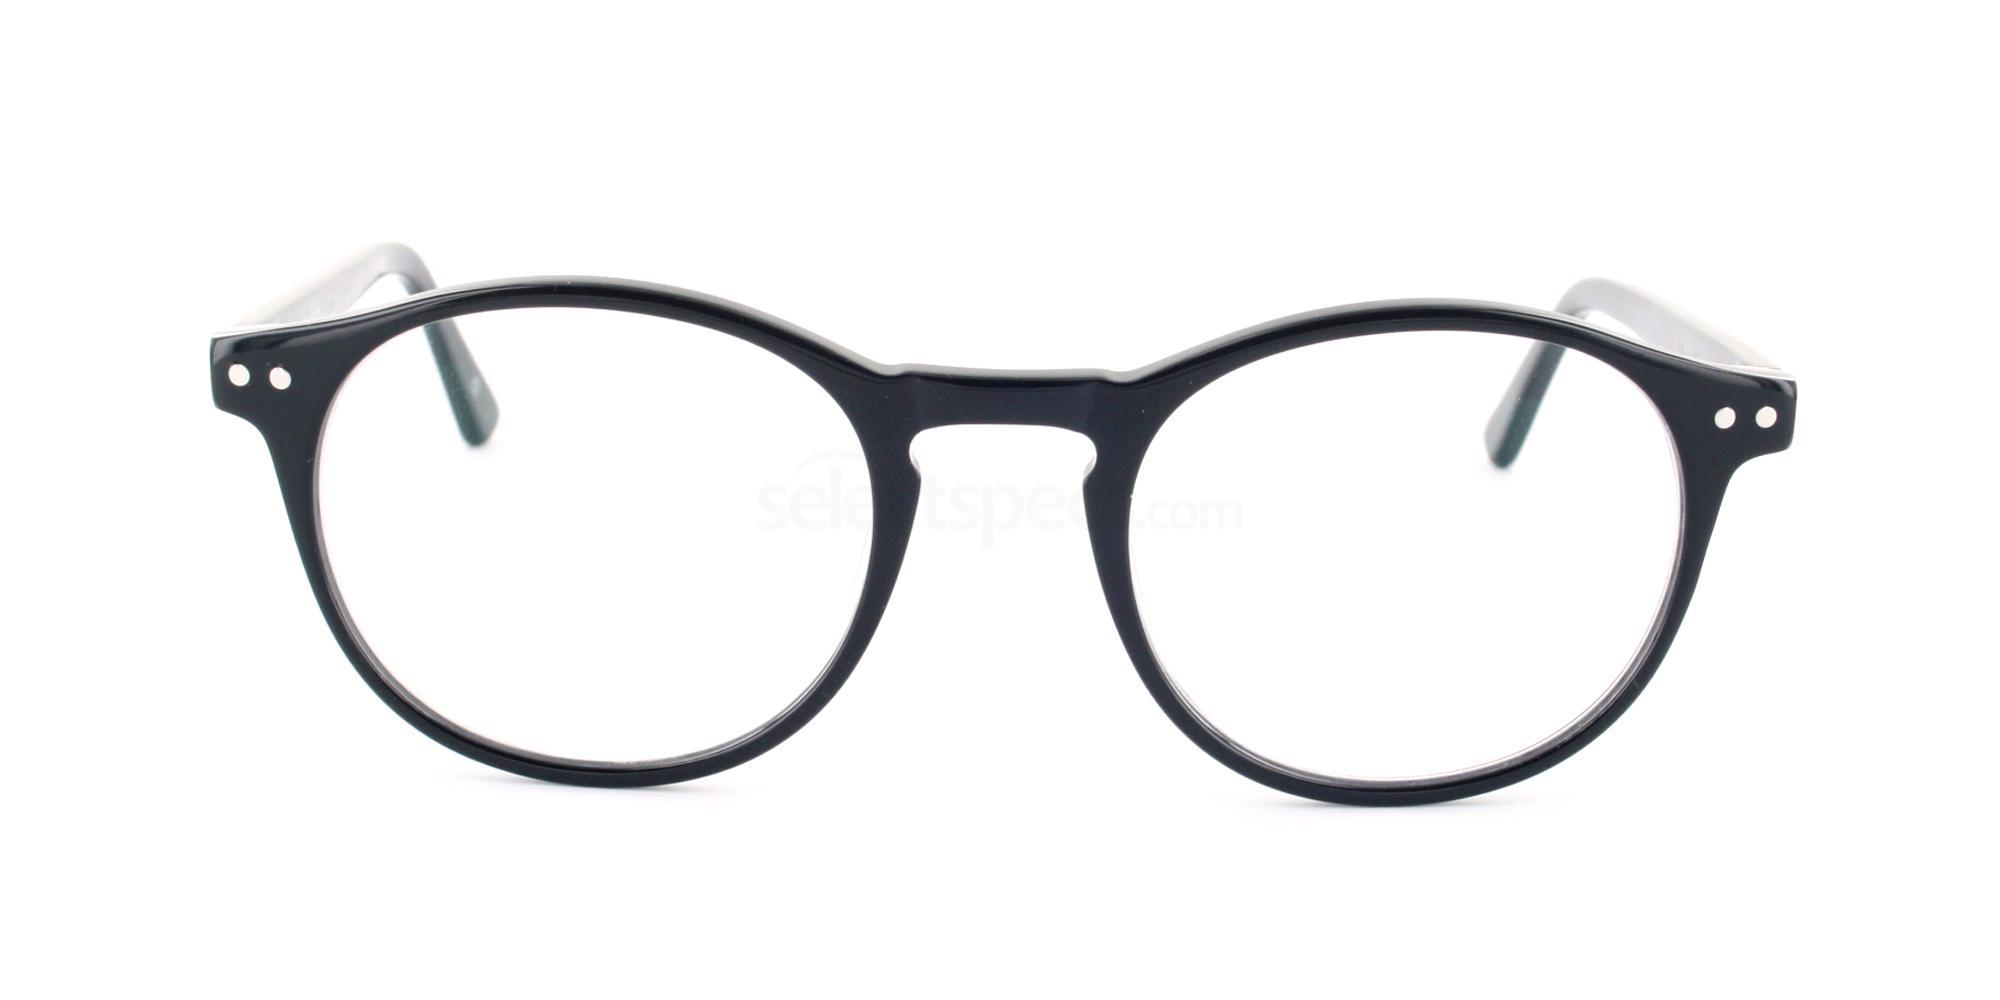 chiara-visione-ucb1008-glasses-at-selectspecs